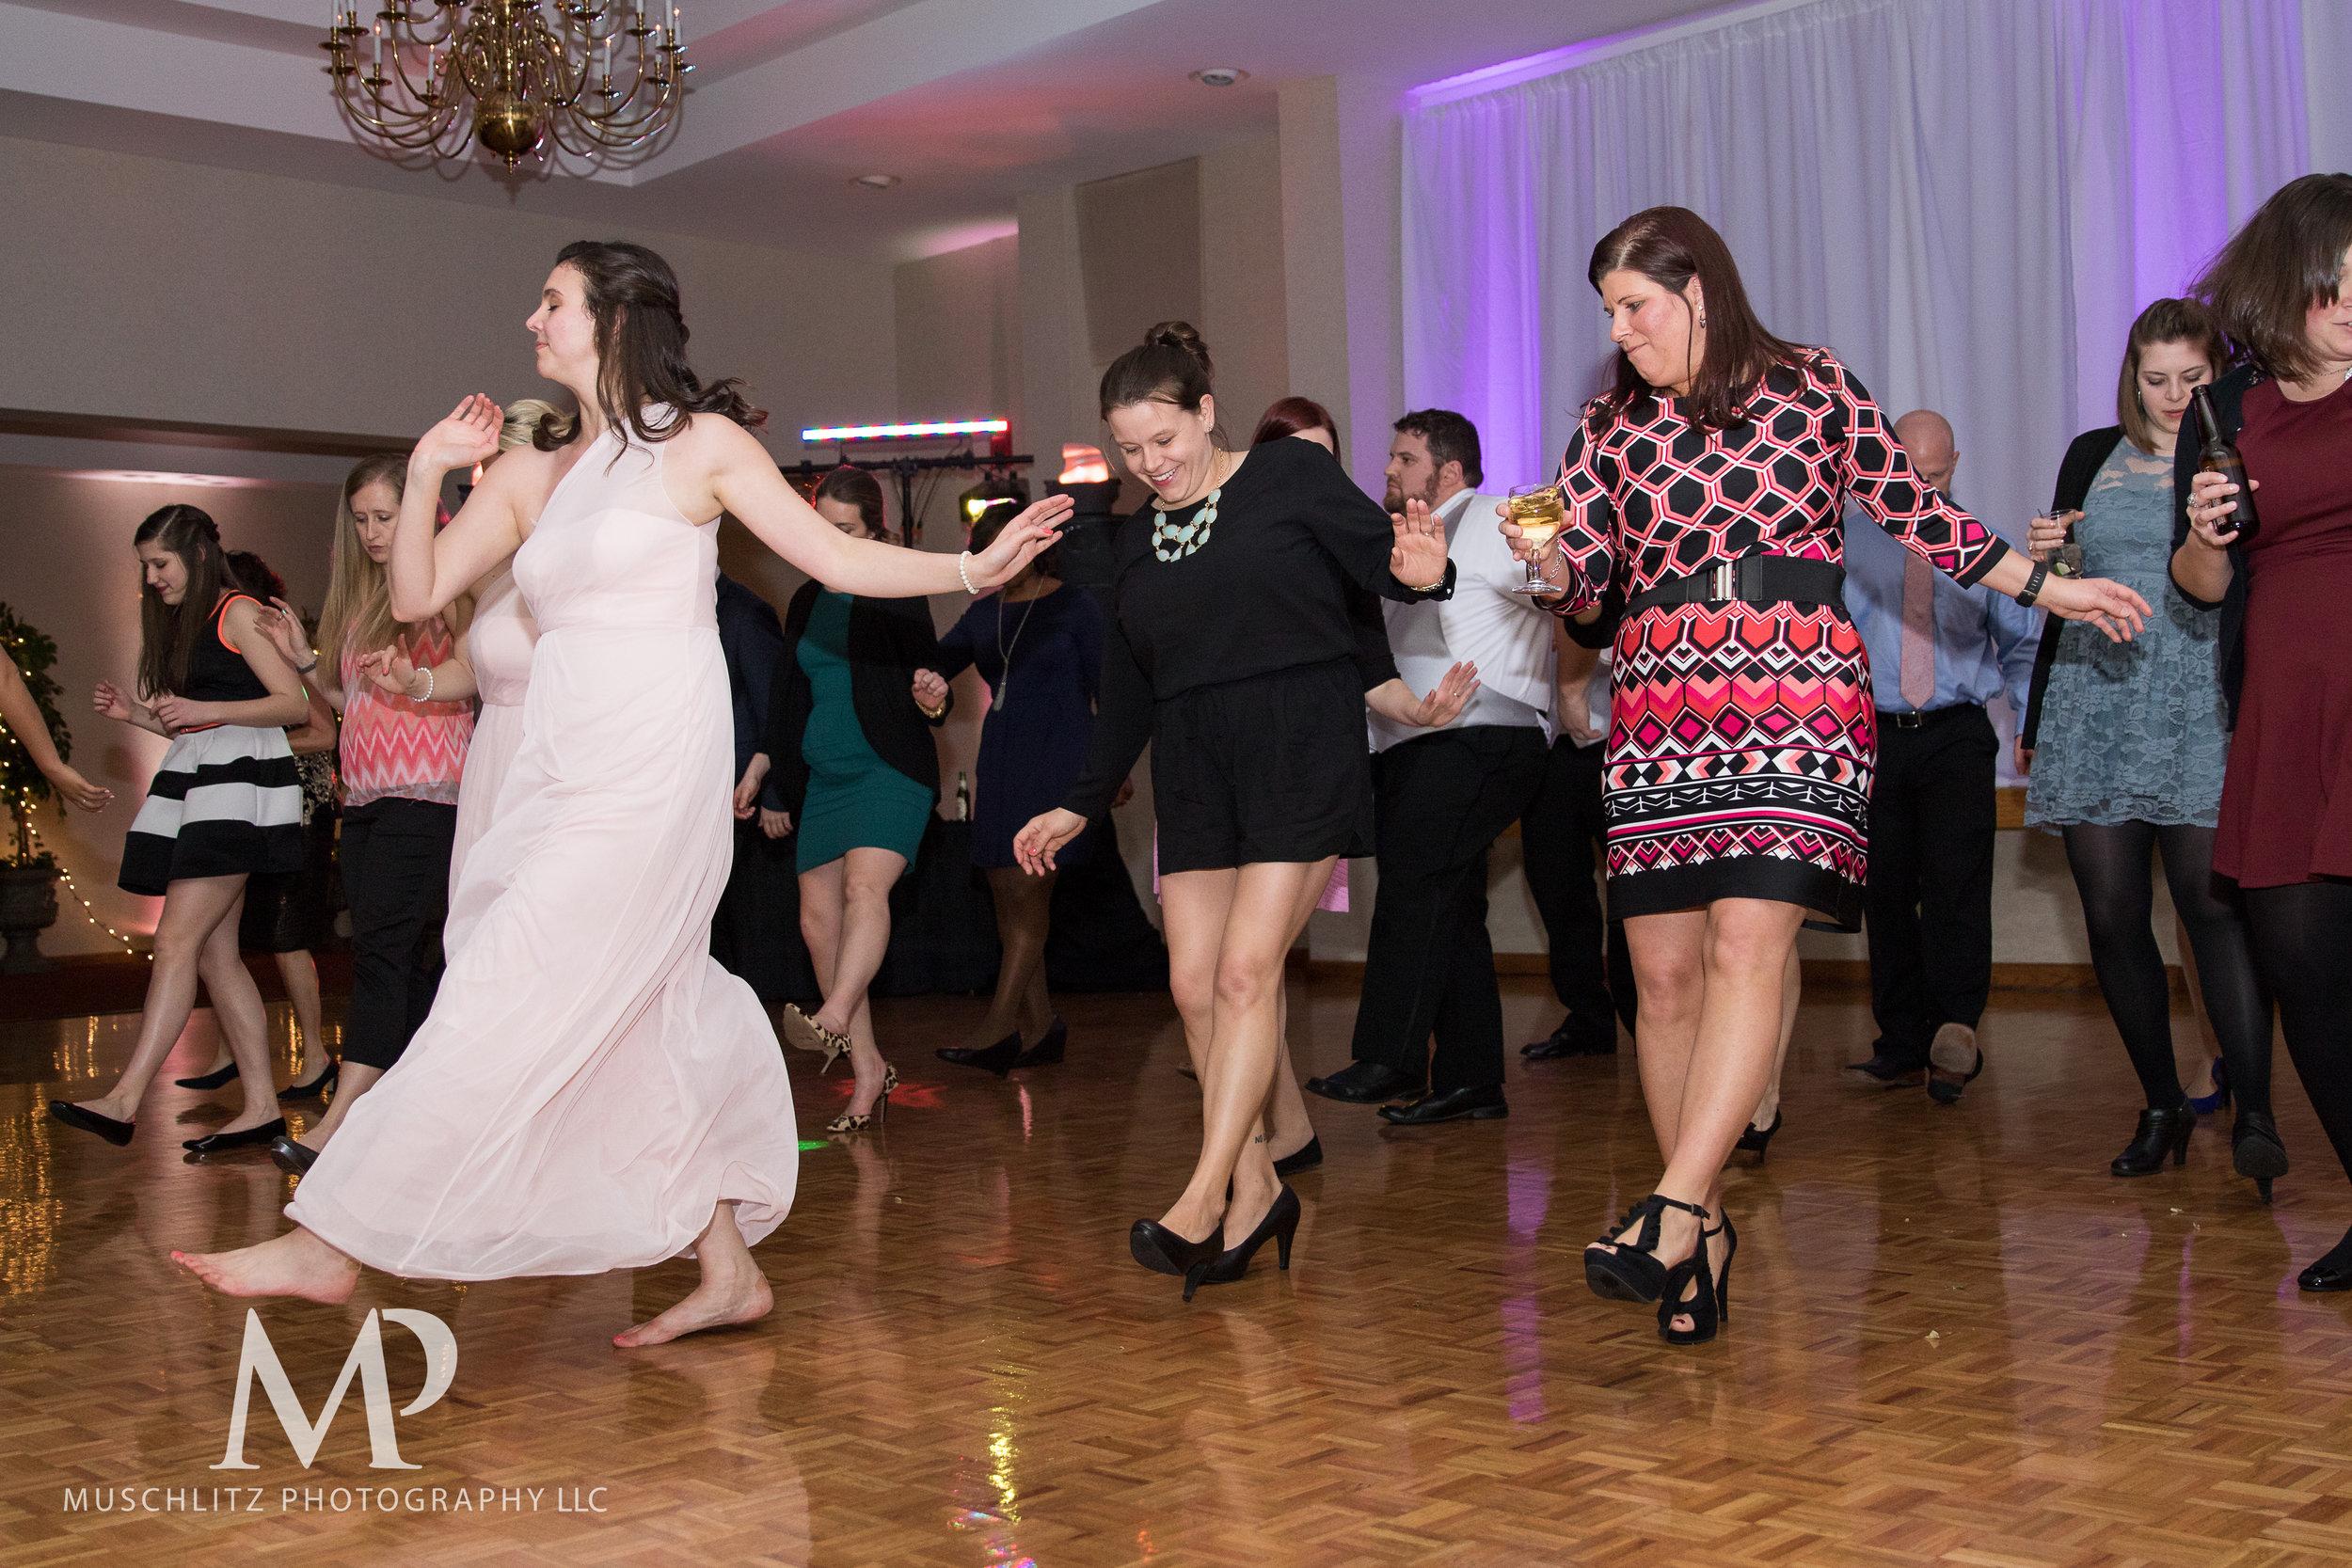 annunciation-banquet-conference-center-downtown-columbus-wedding-reception-downtown-columbus-ohio-muschlitz-photography-032.JPG